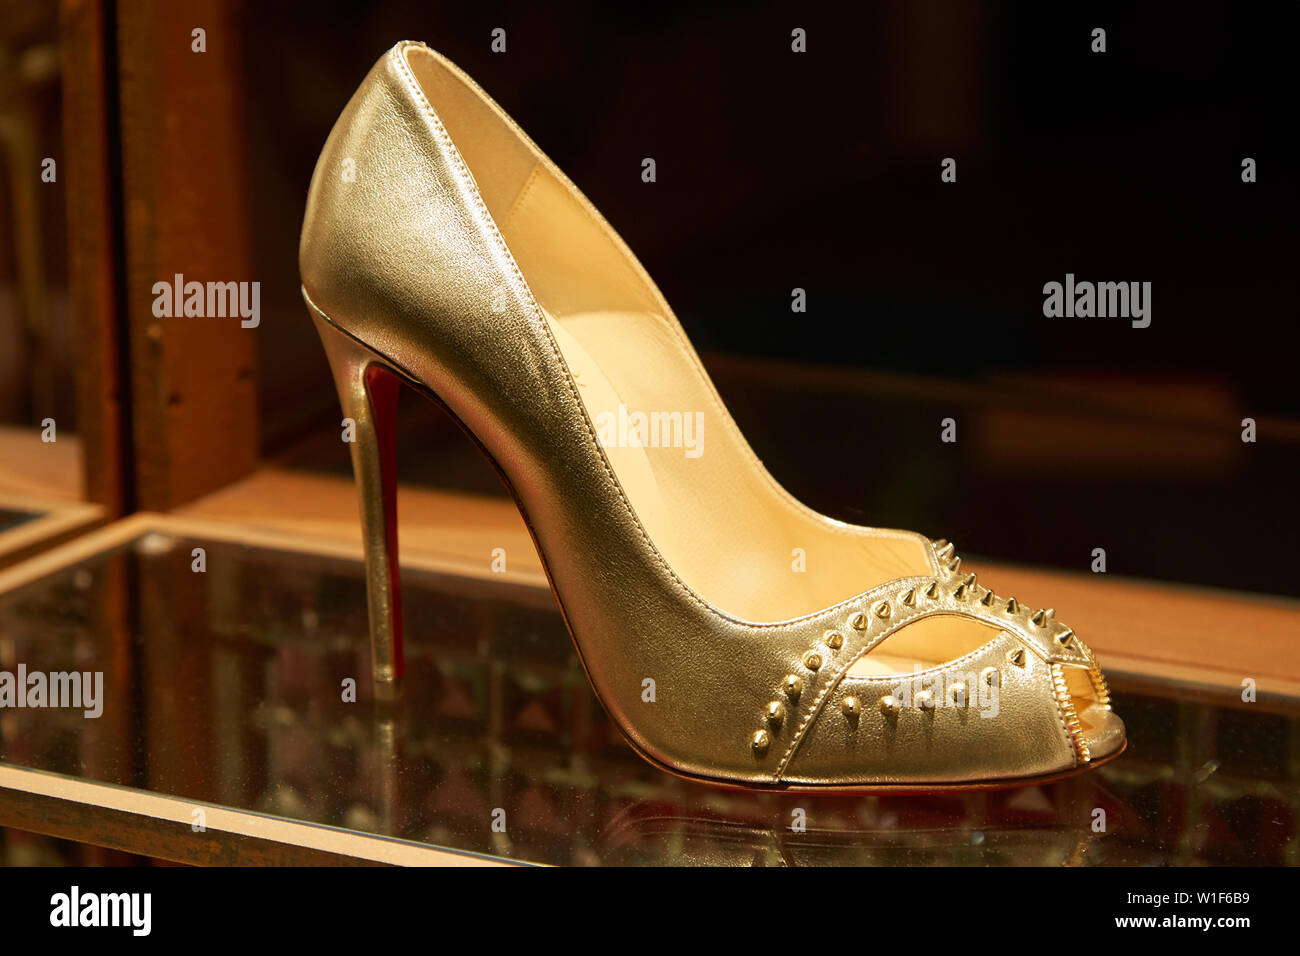 4298cc397c5 Christian Louboutin Shoes Stock Photos & Christian Louboutin Shoes ...